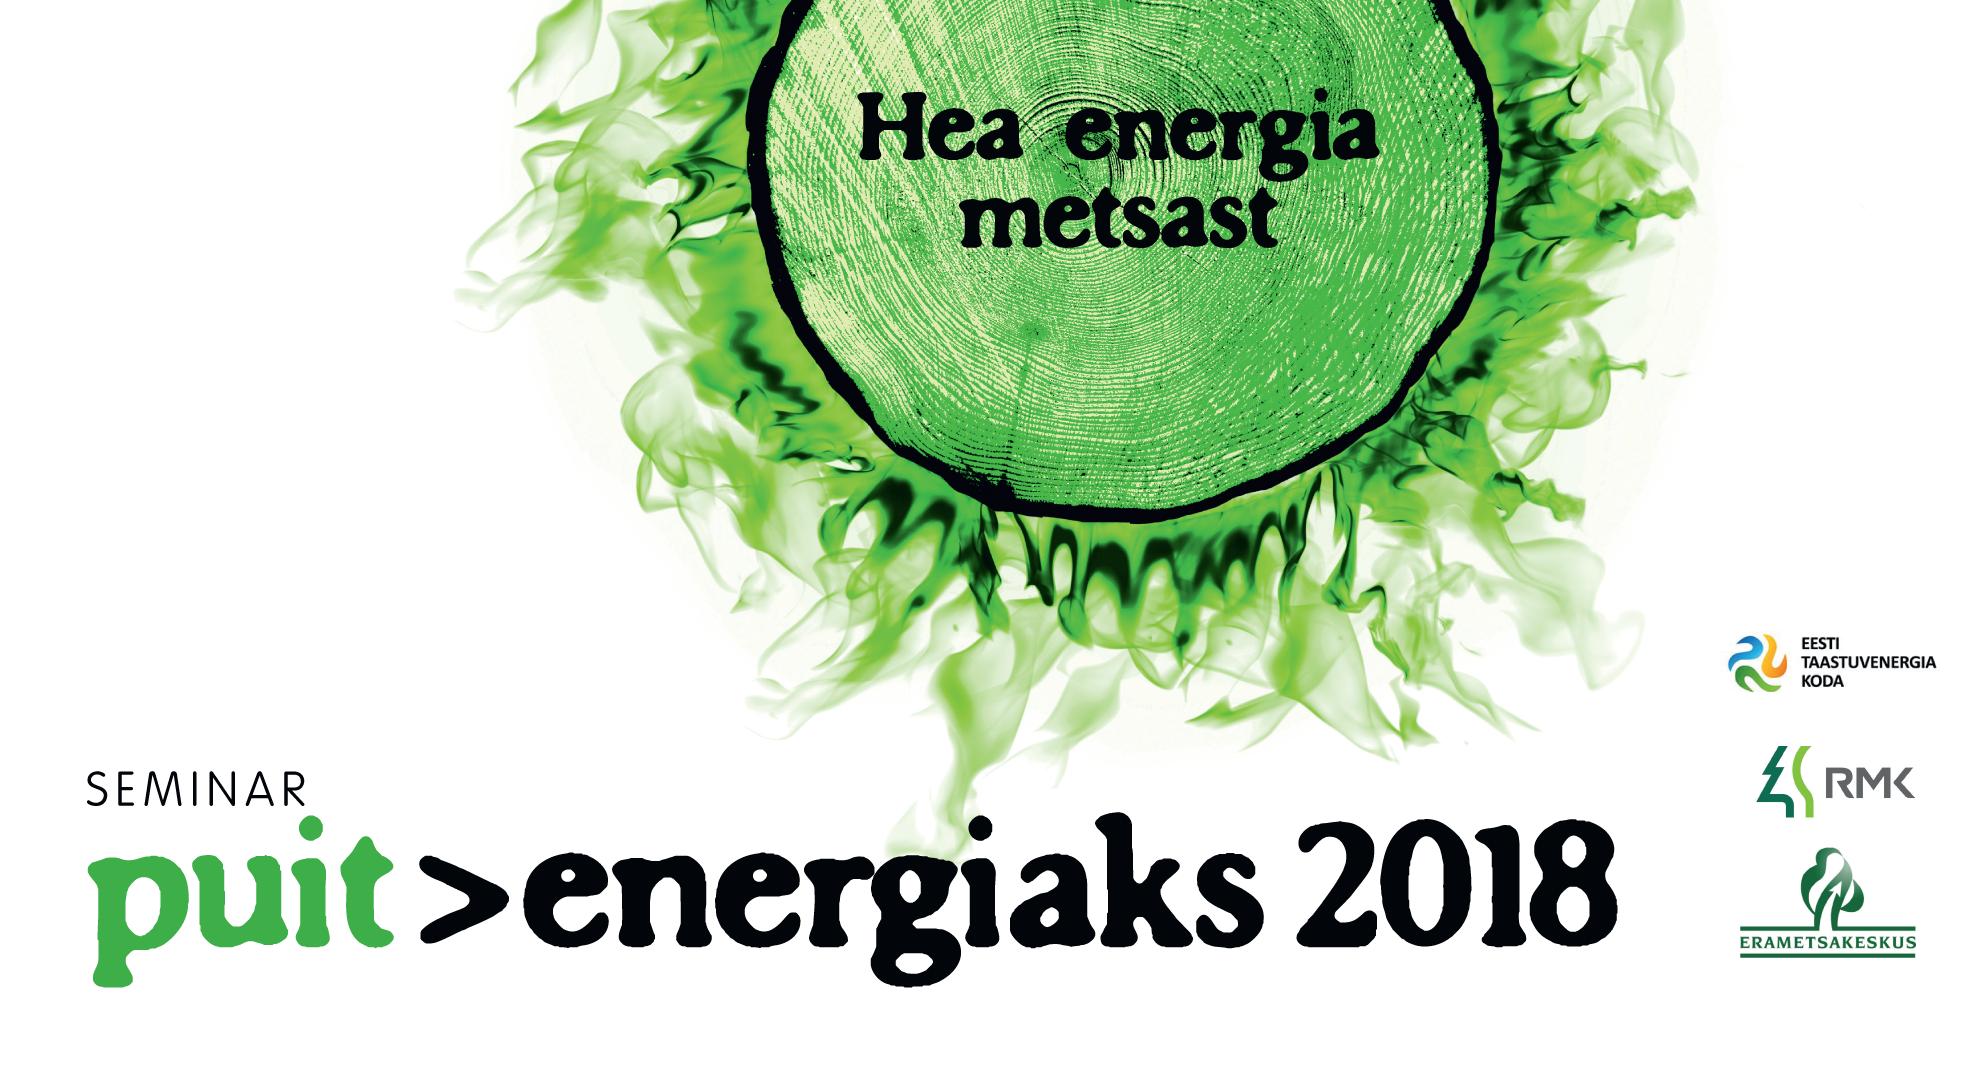 Puit energiaks 2018